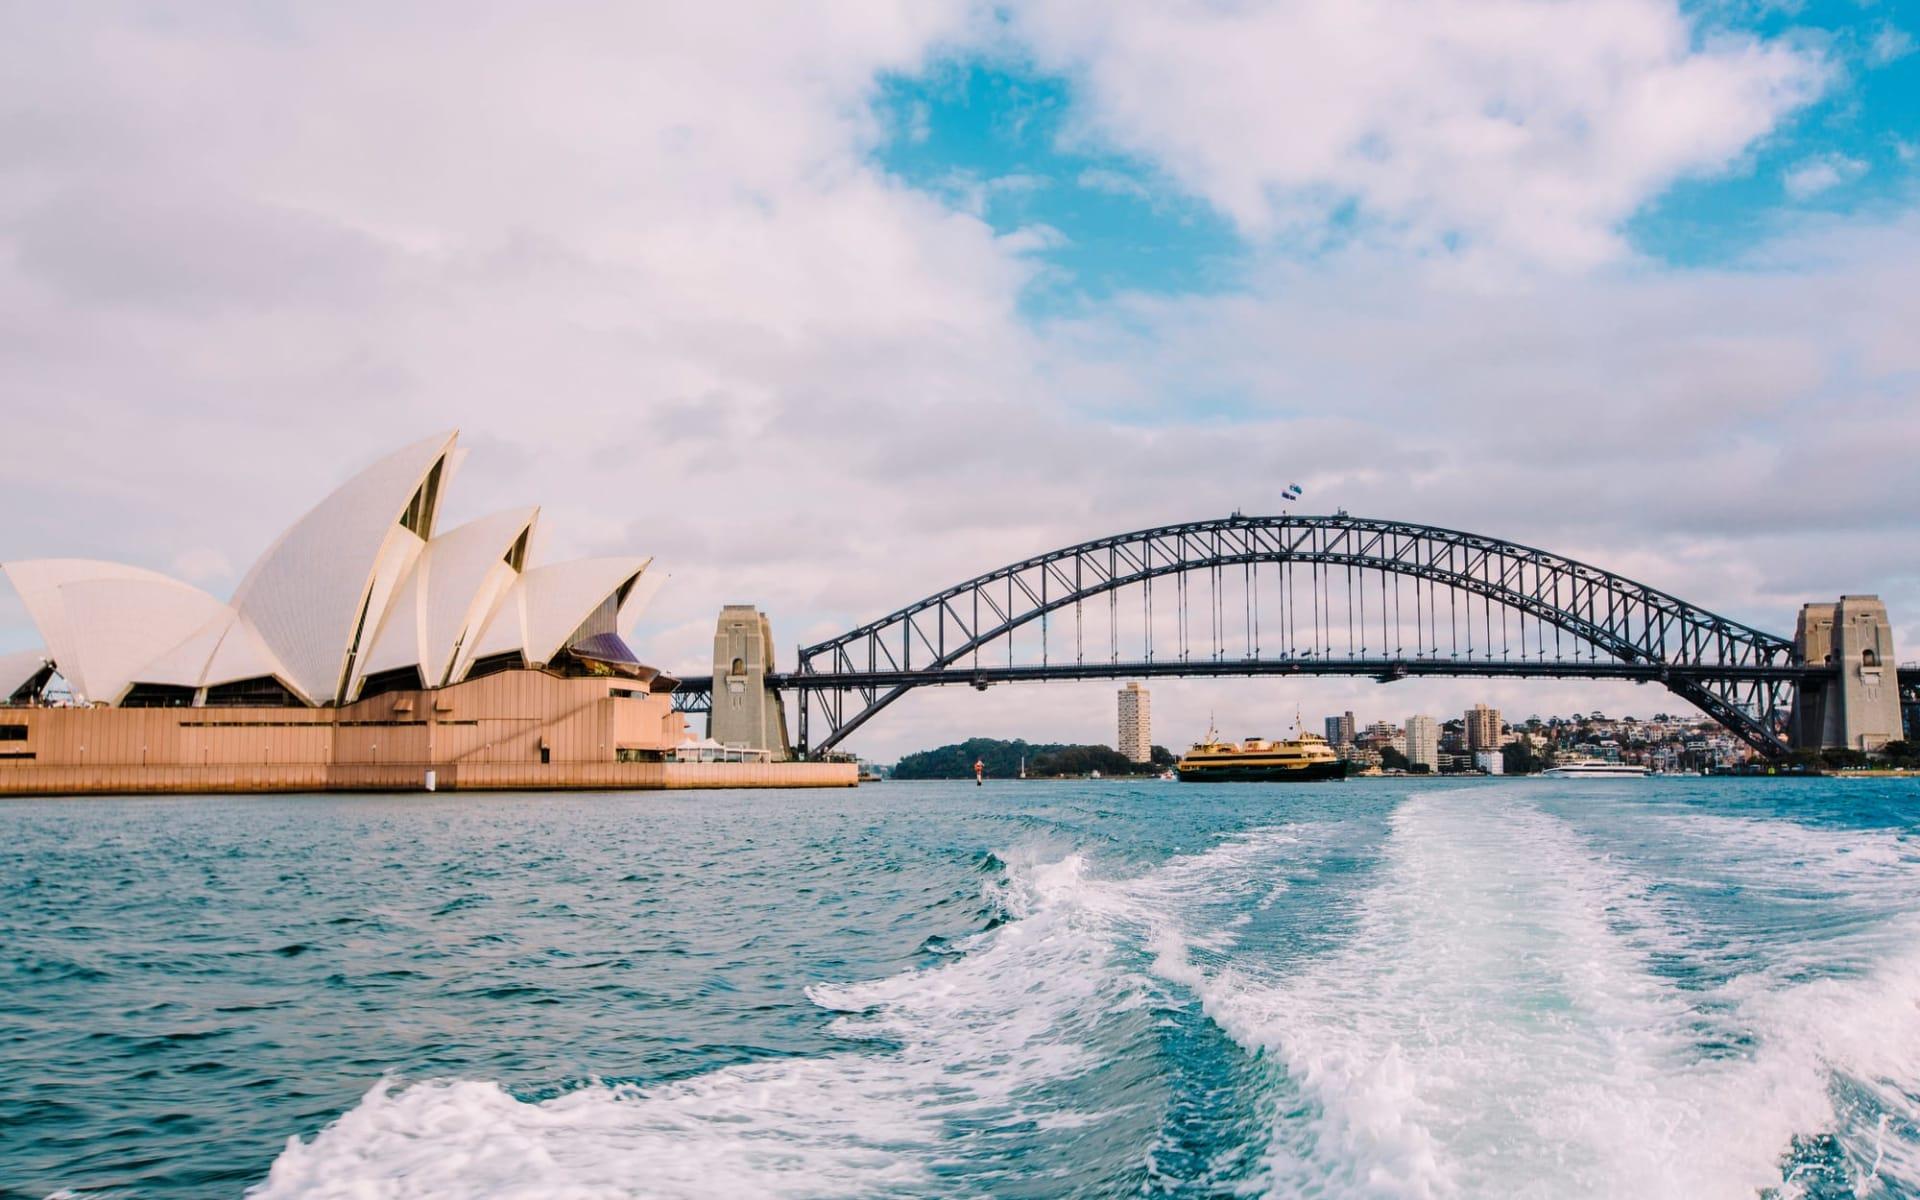 Faszination Australien (AAT Kings) ab Melbourne: Australia - New South Wales - Sydney - Opera und Harbour Bridge